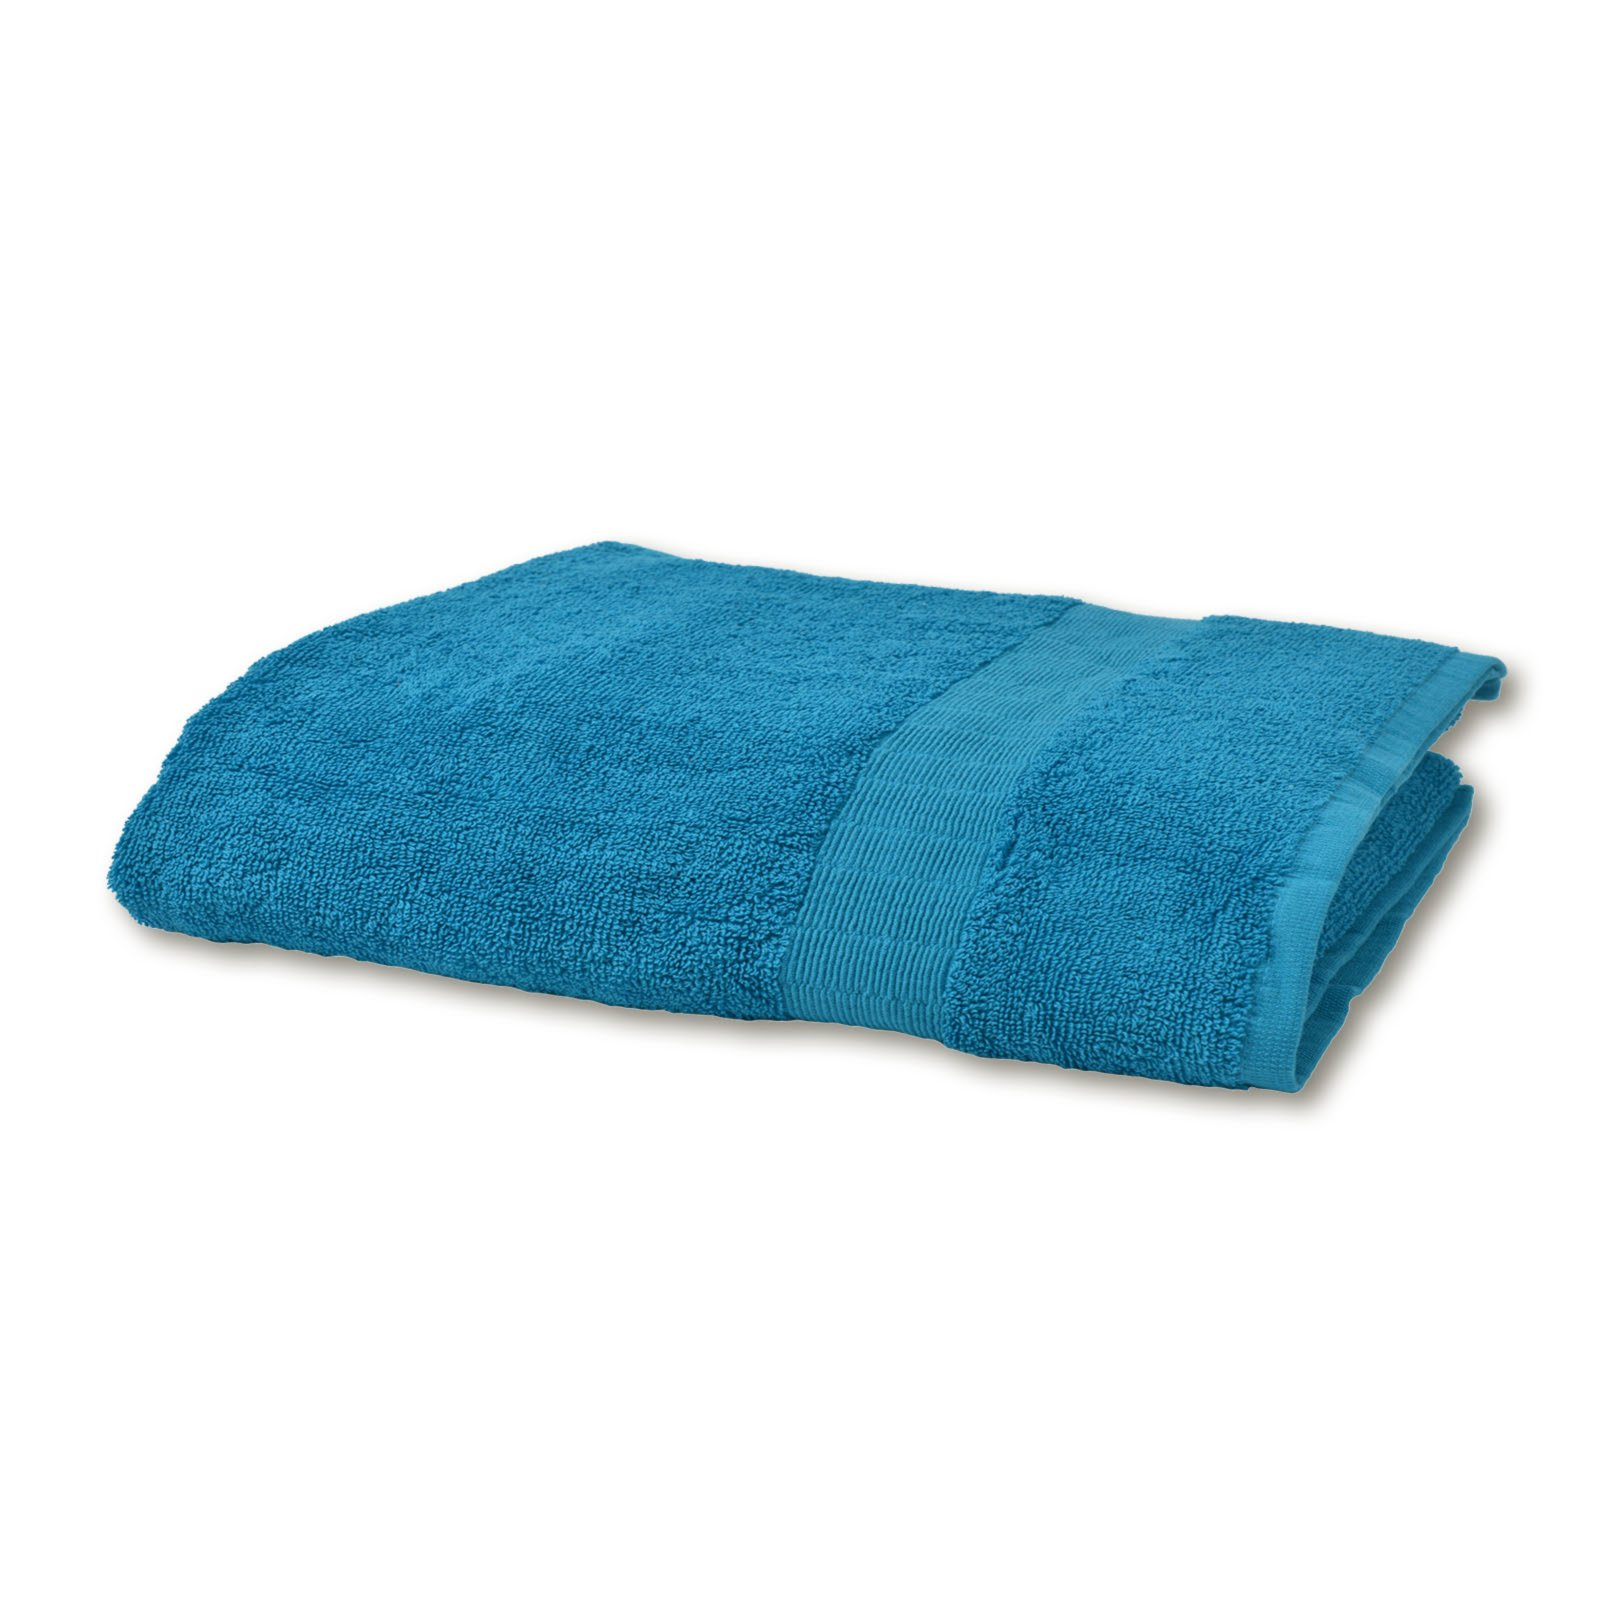 handtuch caesar t rkis baumwolle 50x100 cm handt cher badtextilien bad accessoires. Black Bedroom Furniture Sets. Home Design Ideas